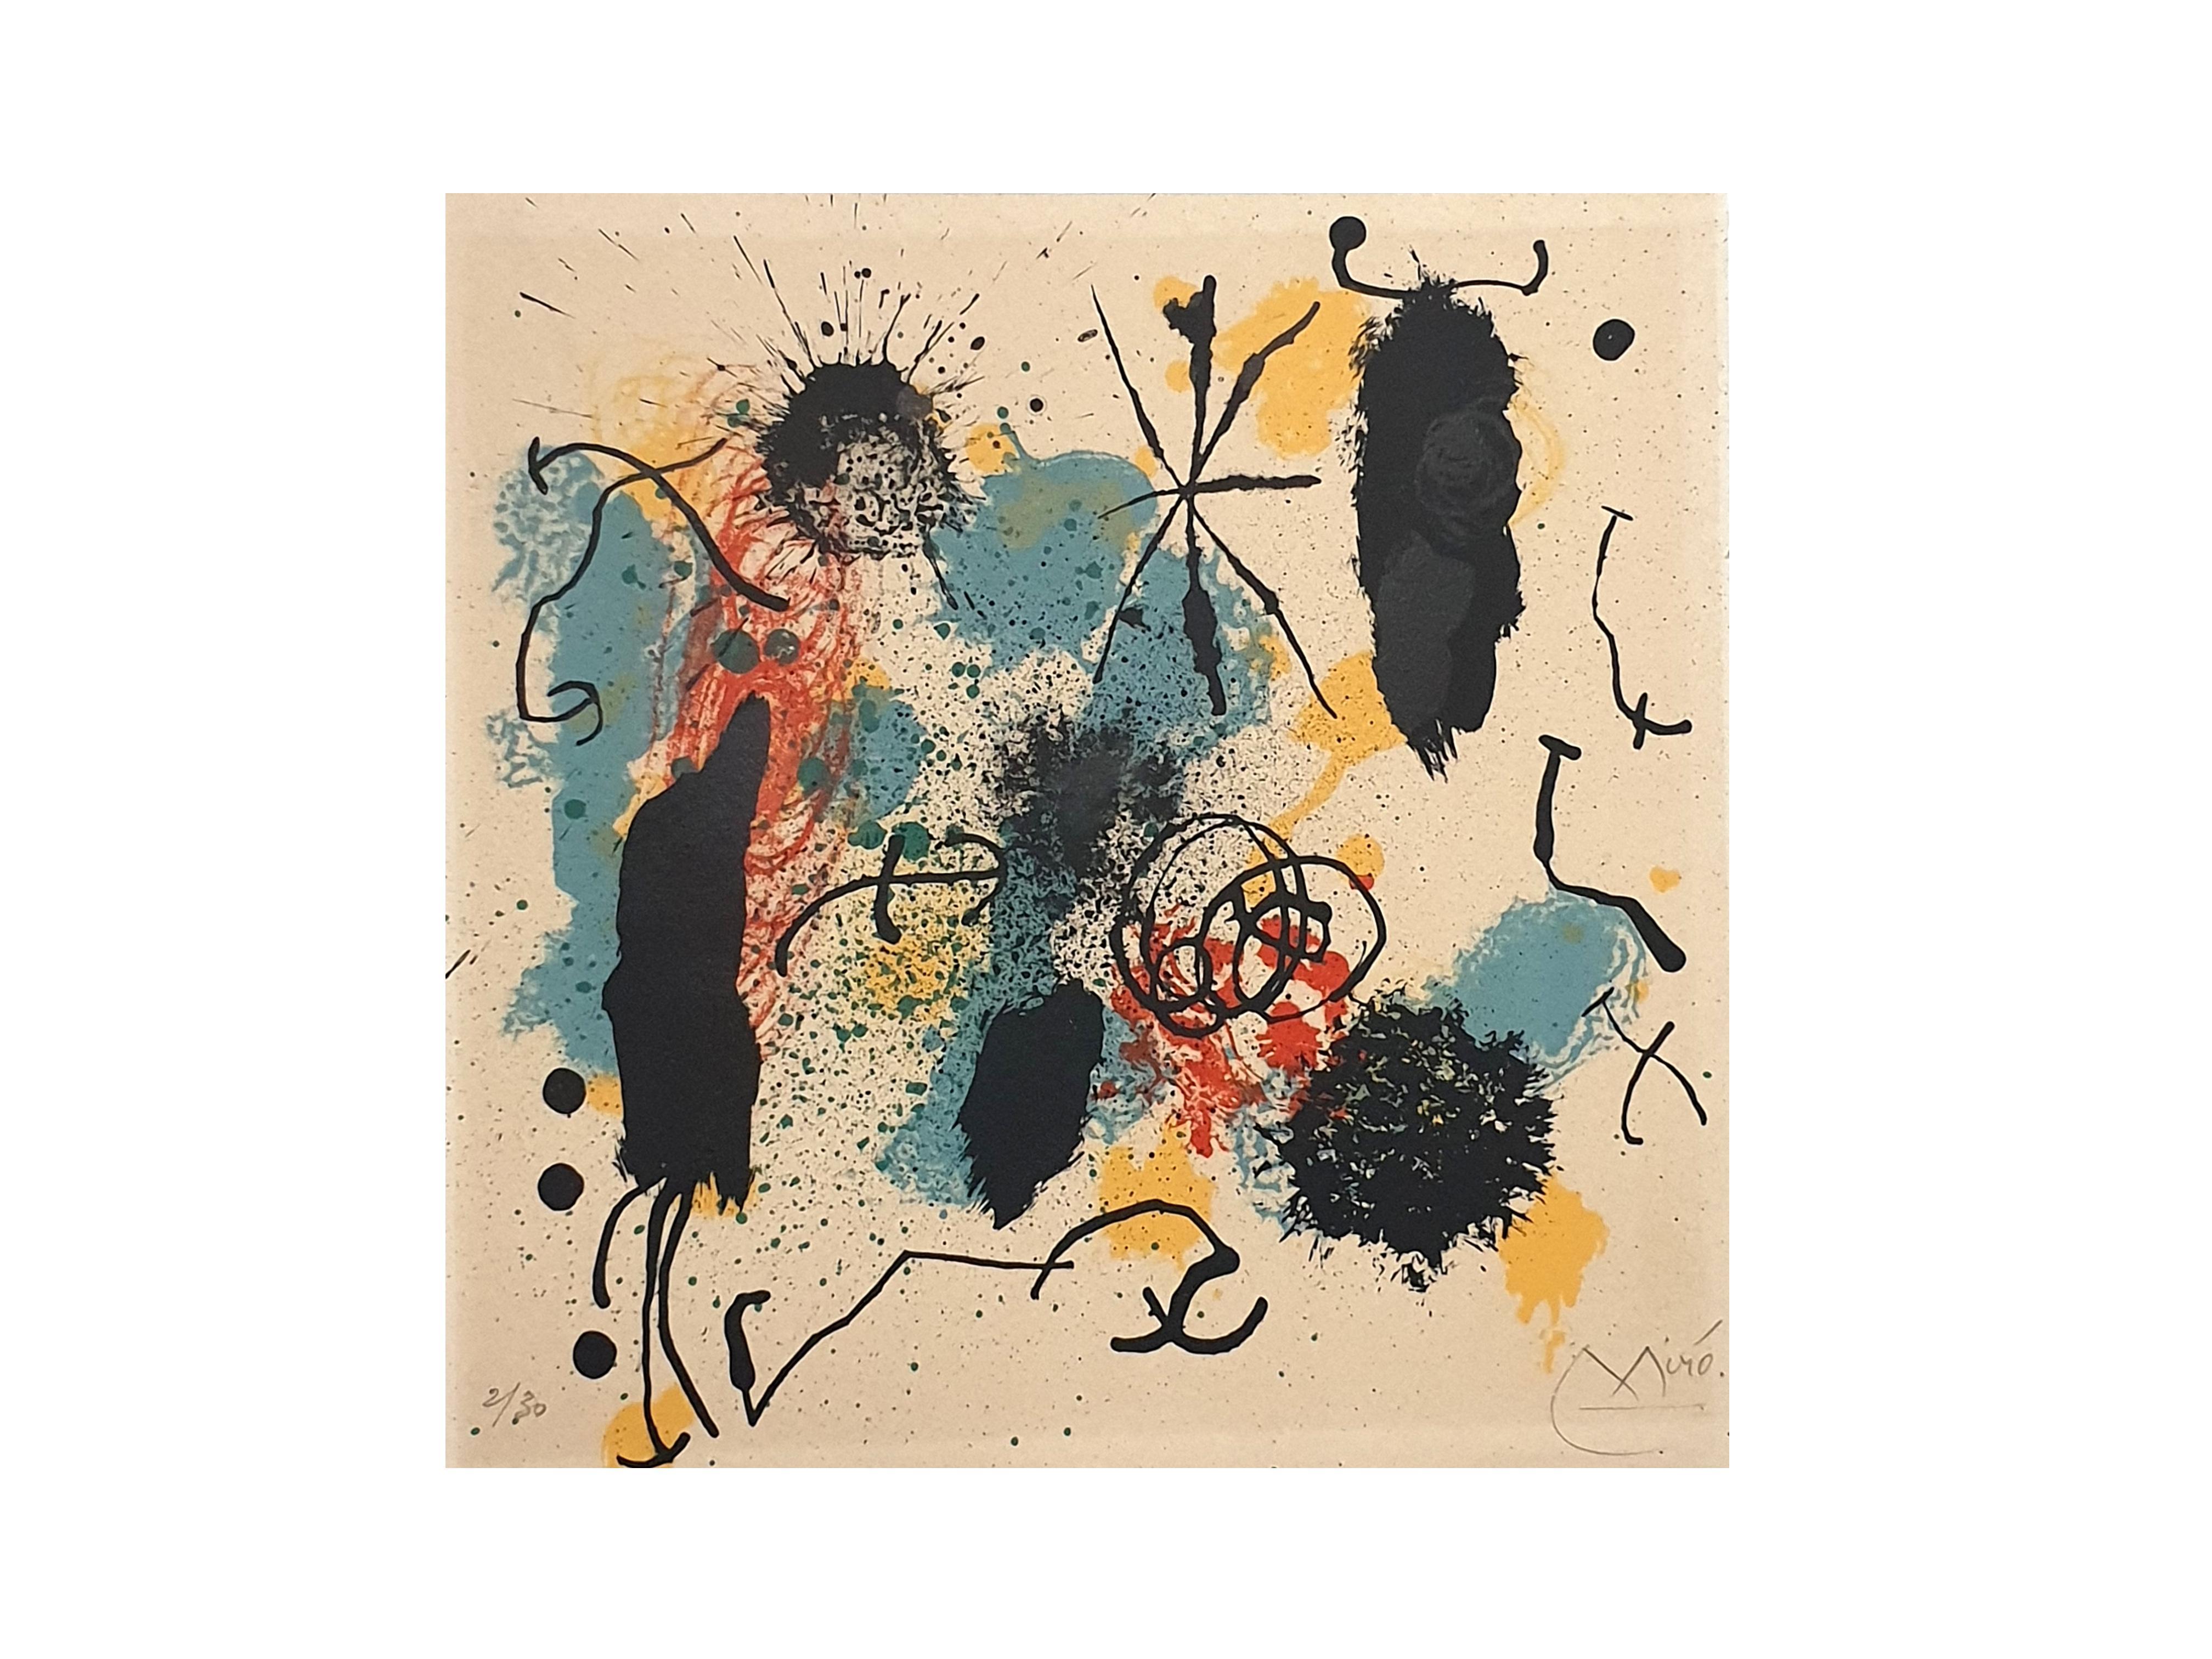 Joan Miro - I Work Like a Gardener - Original Handsigned Lithograph